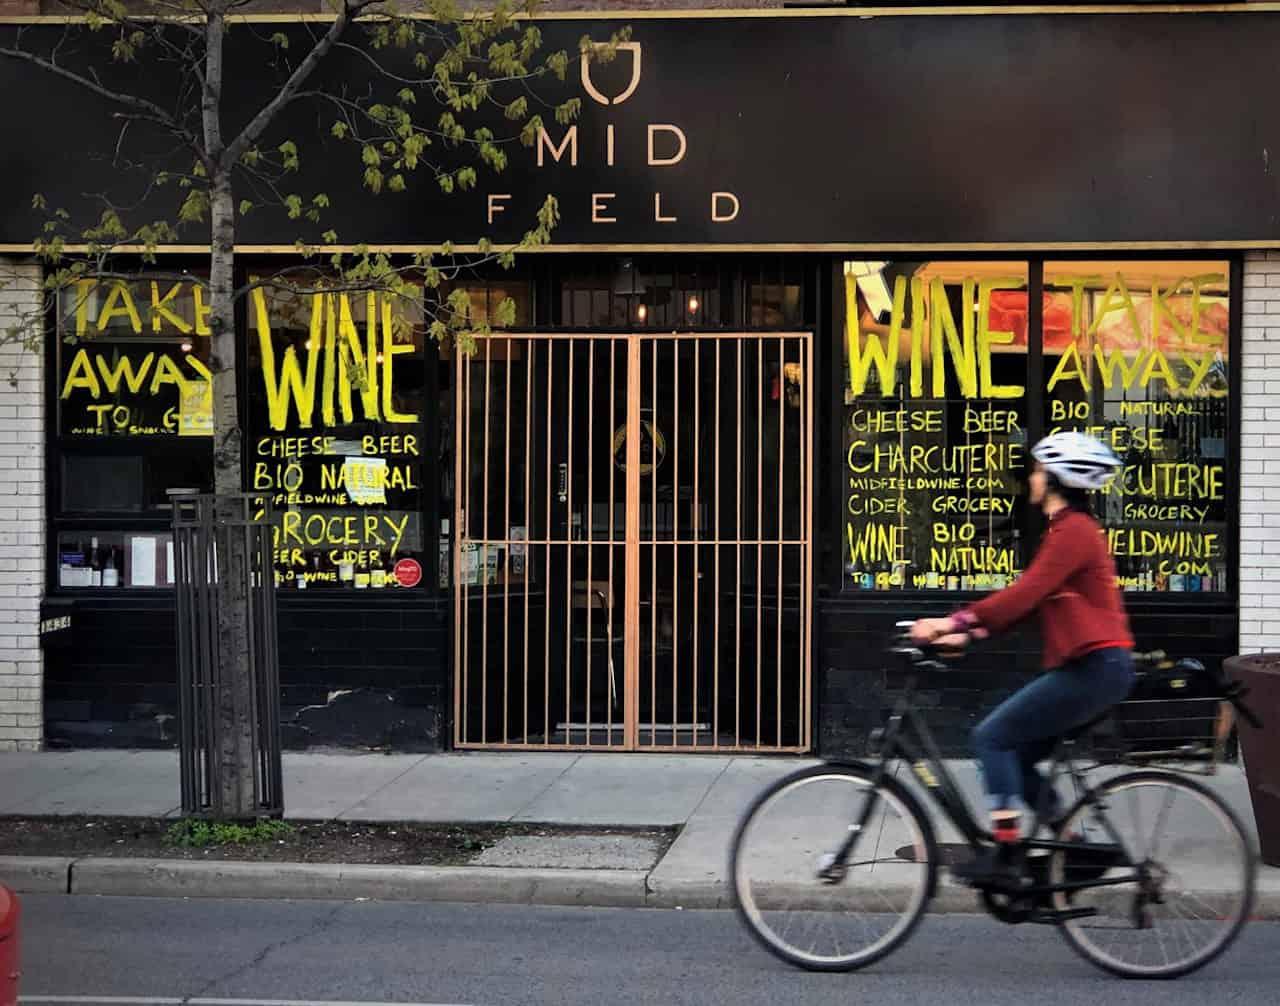 Exterior image of Midfield Wine Bar in Toronto